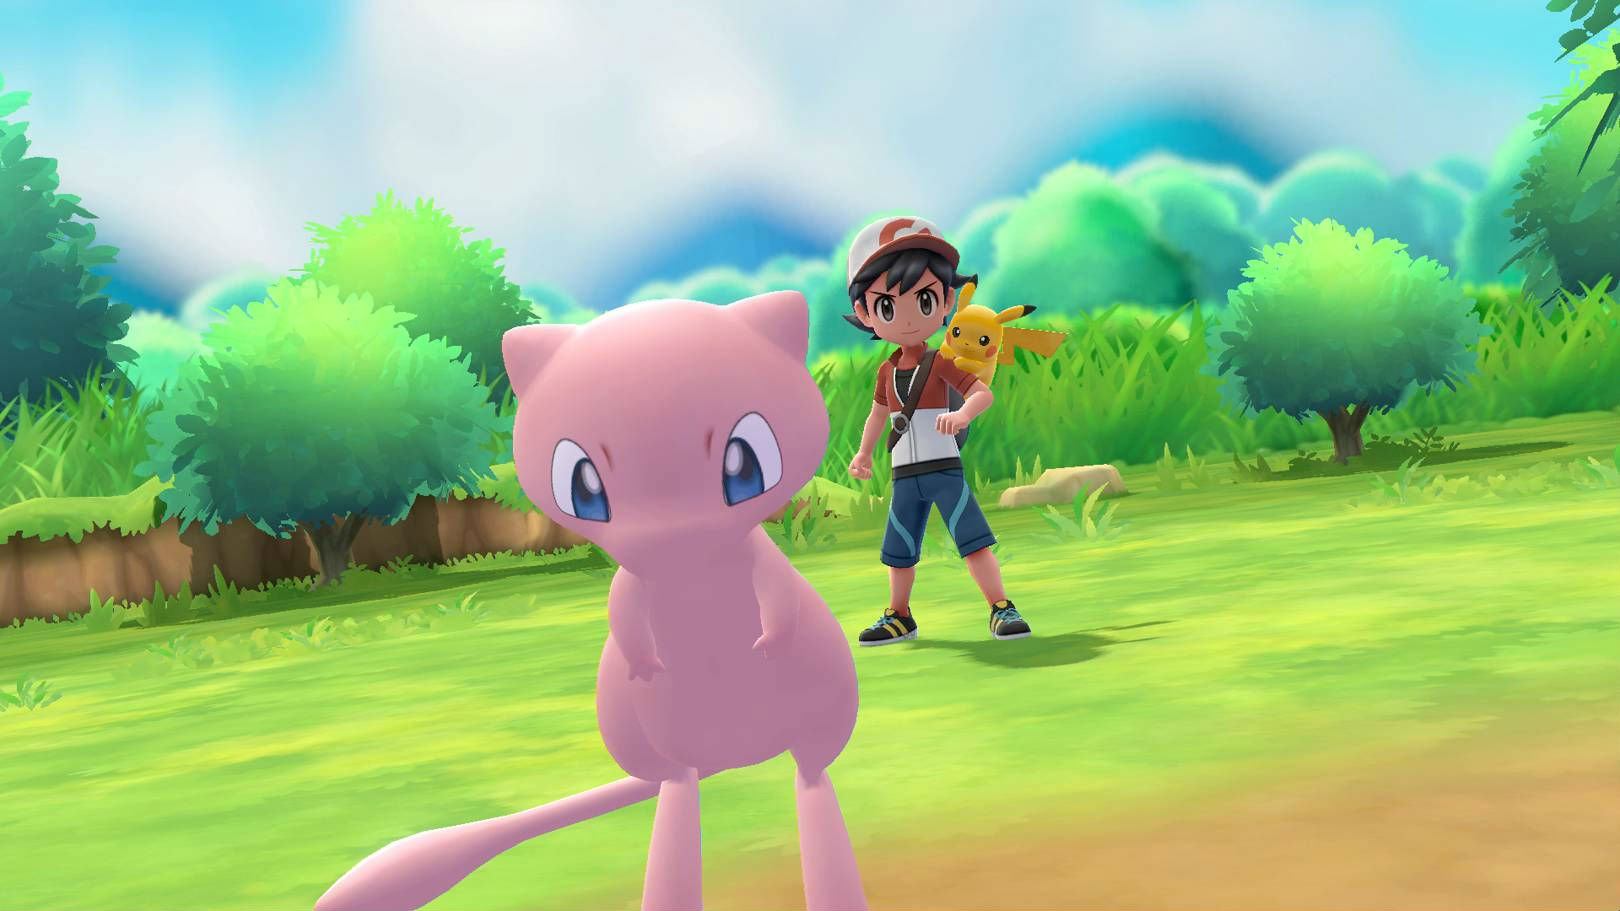 Pokemon Let's Go could be Junichi Masuda's directorial swan song screenshot